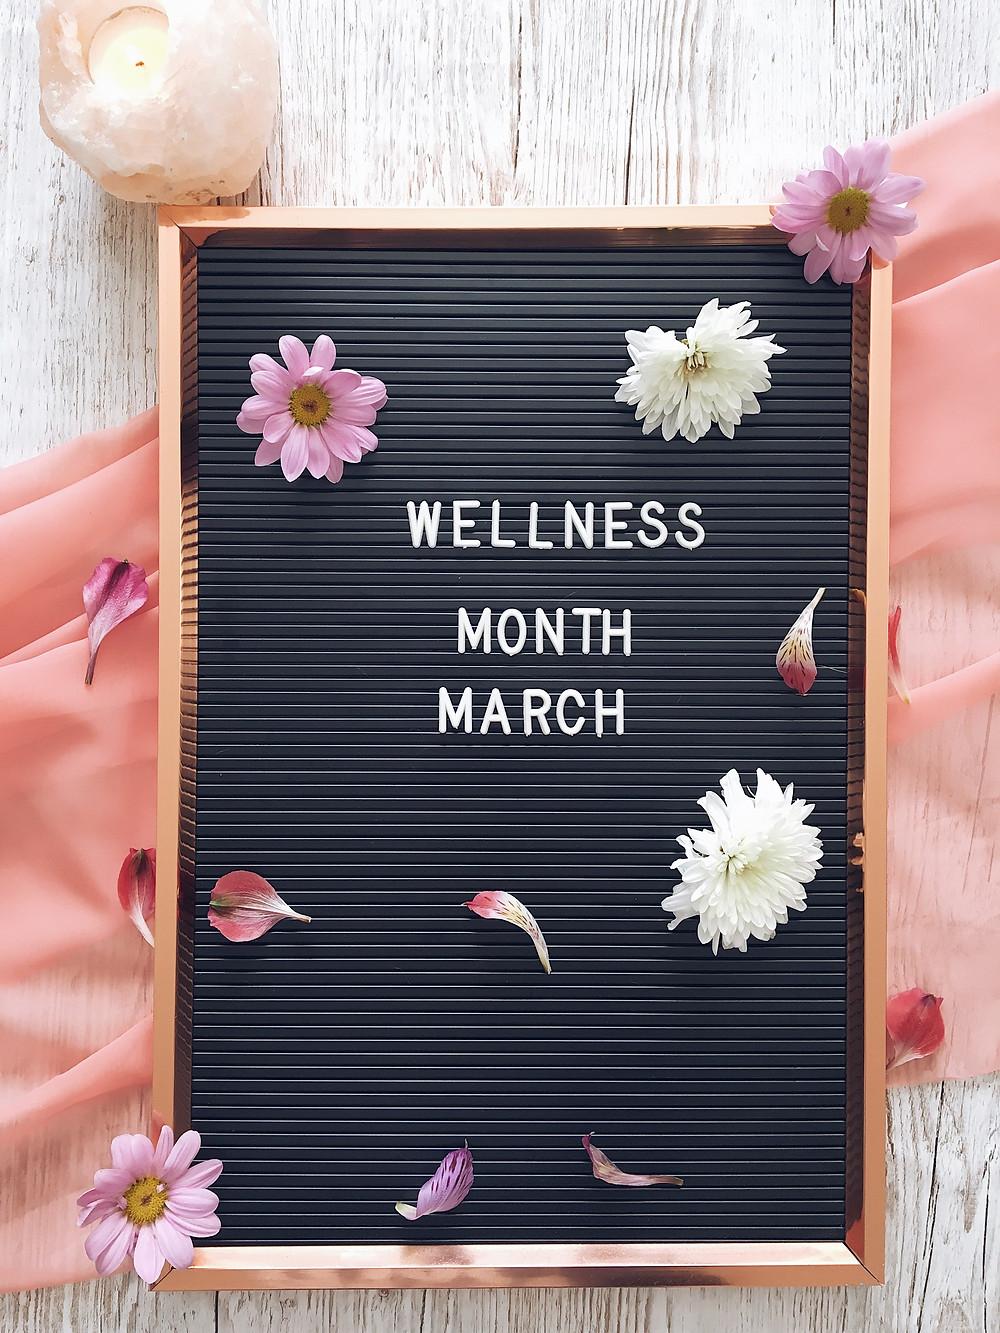 Wellness Month